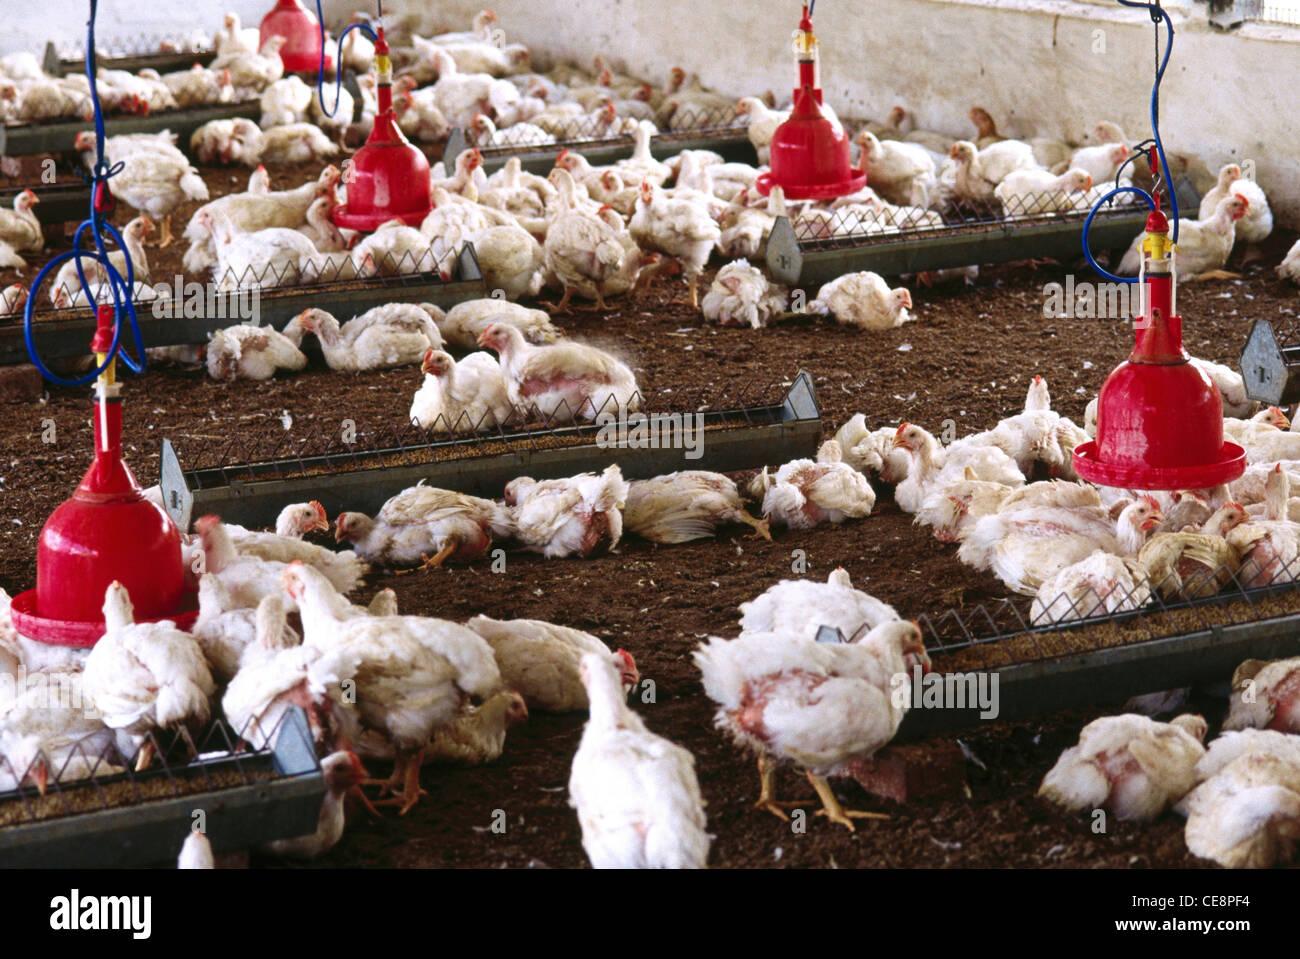 Farming Karnataka Stock Photos & Farming Karnataka Stock Images